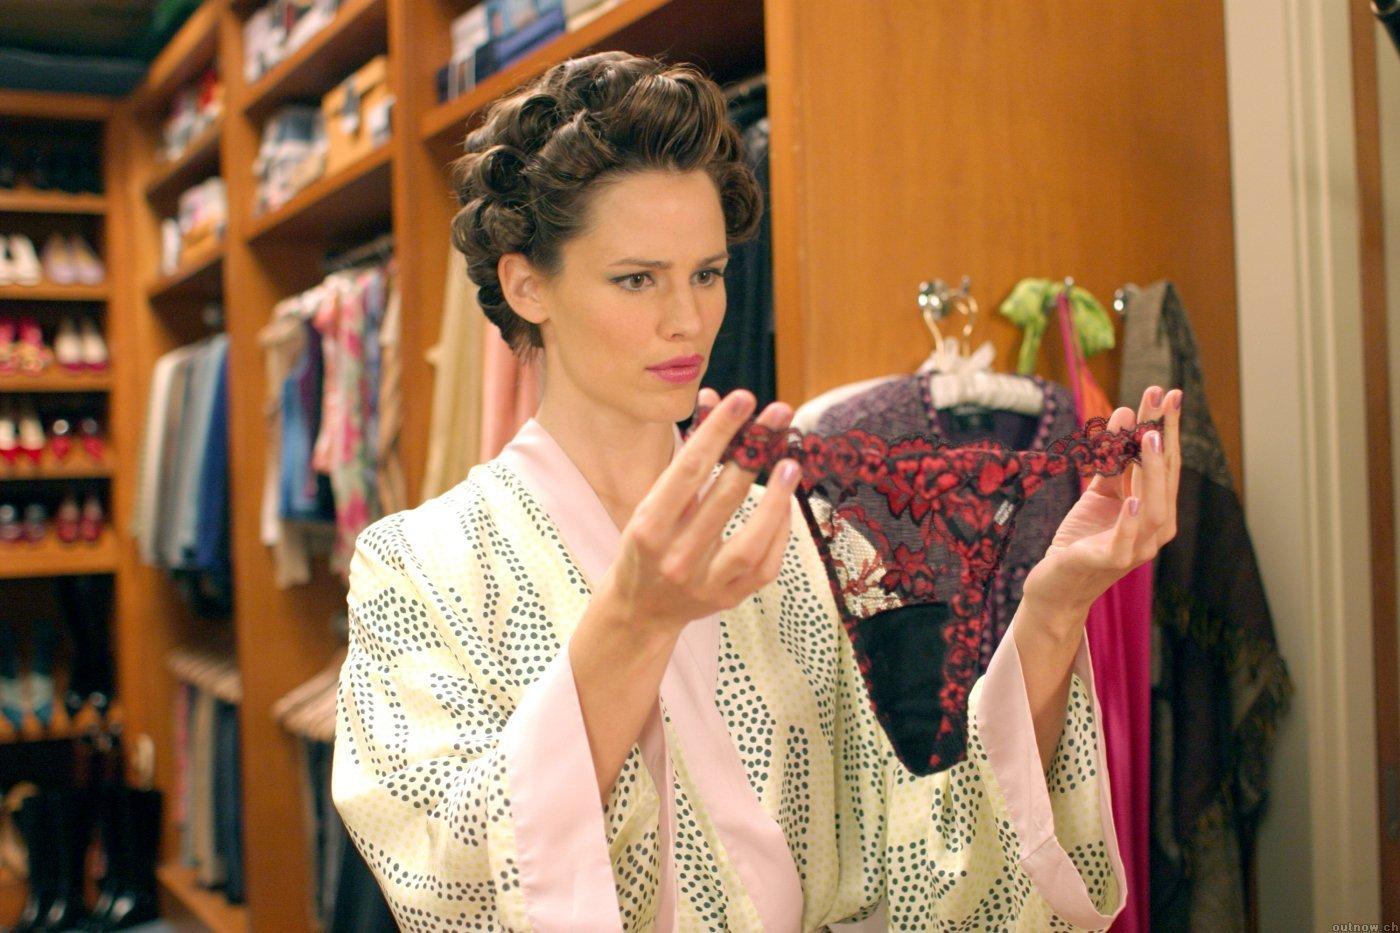 Jennifer Garner in 13 going on 30, looking at a pair of panties